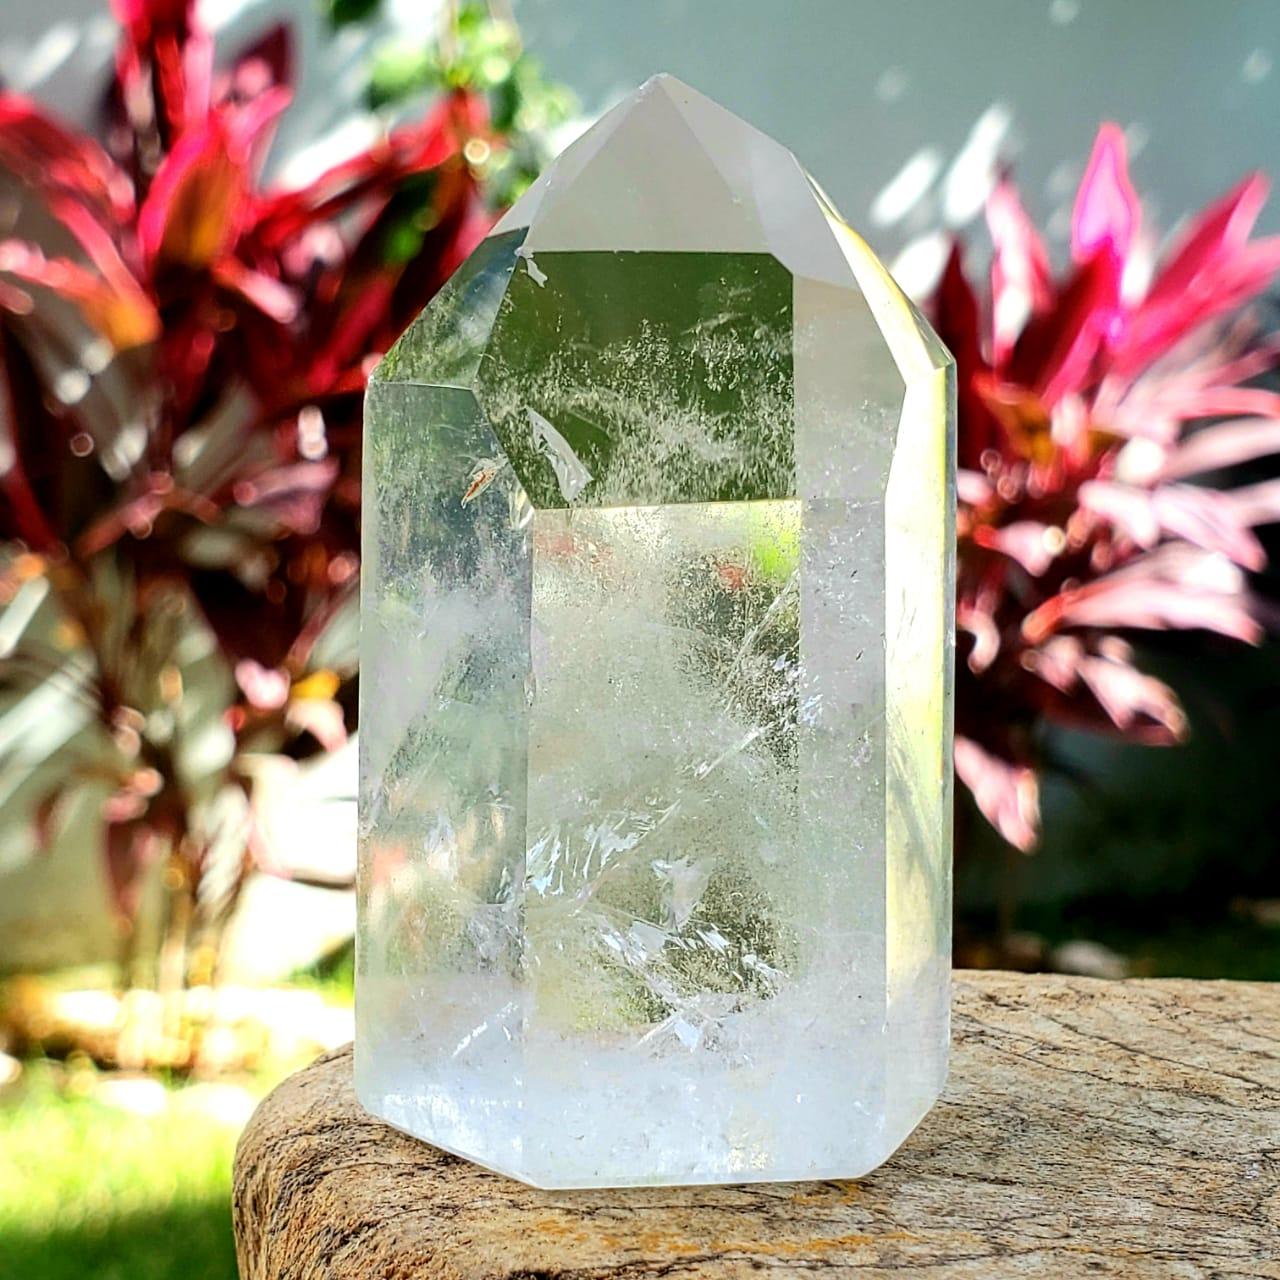 Cristal - Ponta - Quartzo Branco Lapidada